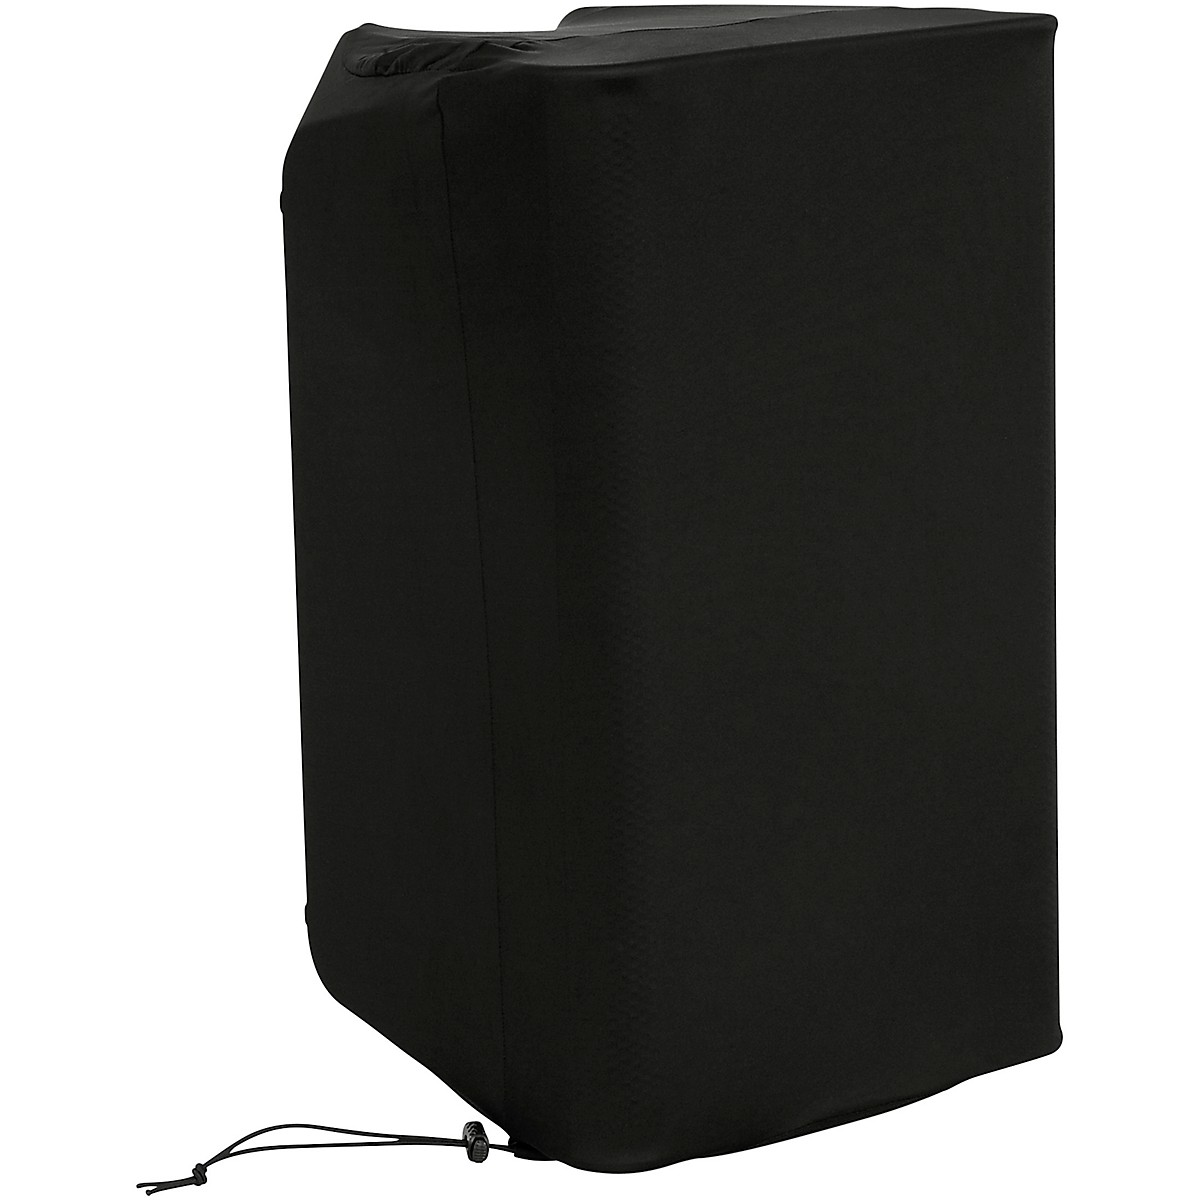 Gator GPA-STRETCH-10-B Black Stretchy Speaker Cover for 10-12